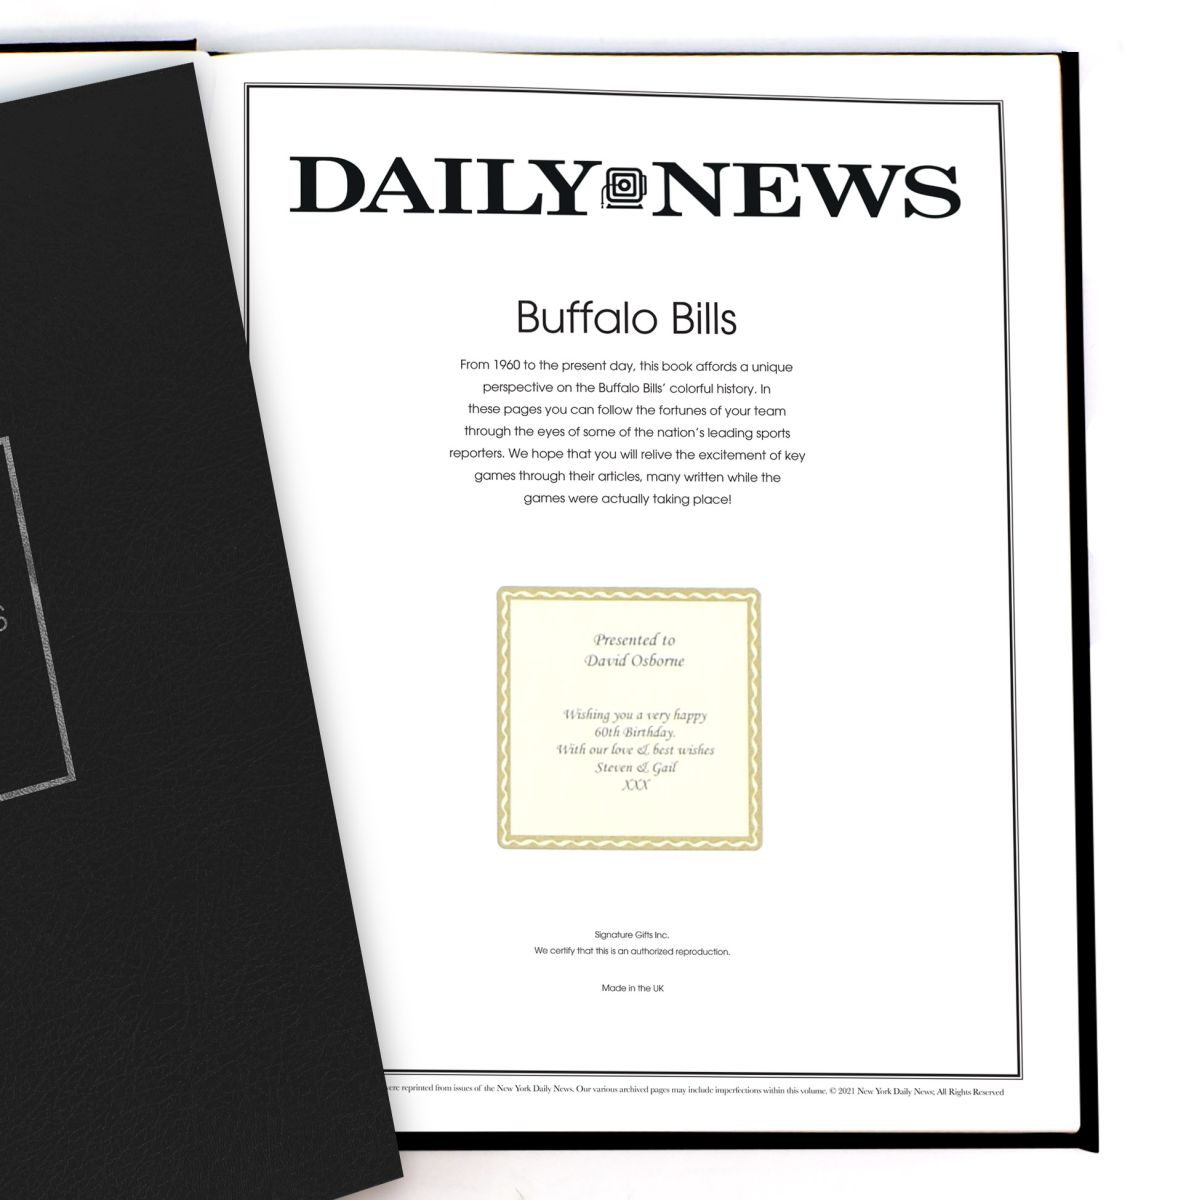 """History of the Buffalo Bills"" Newspaper Book"